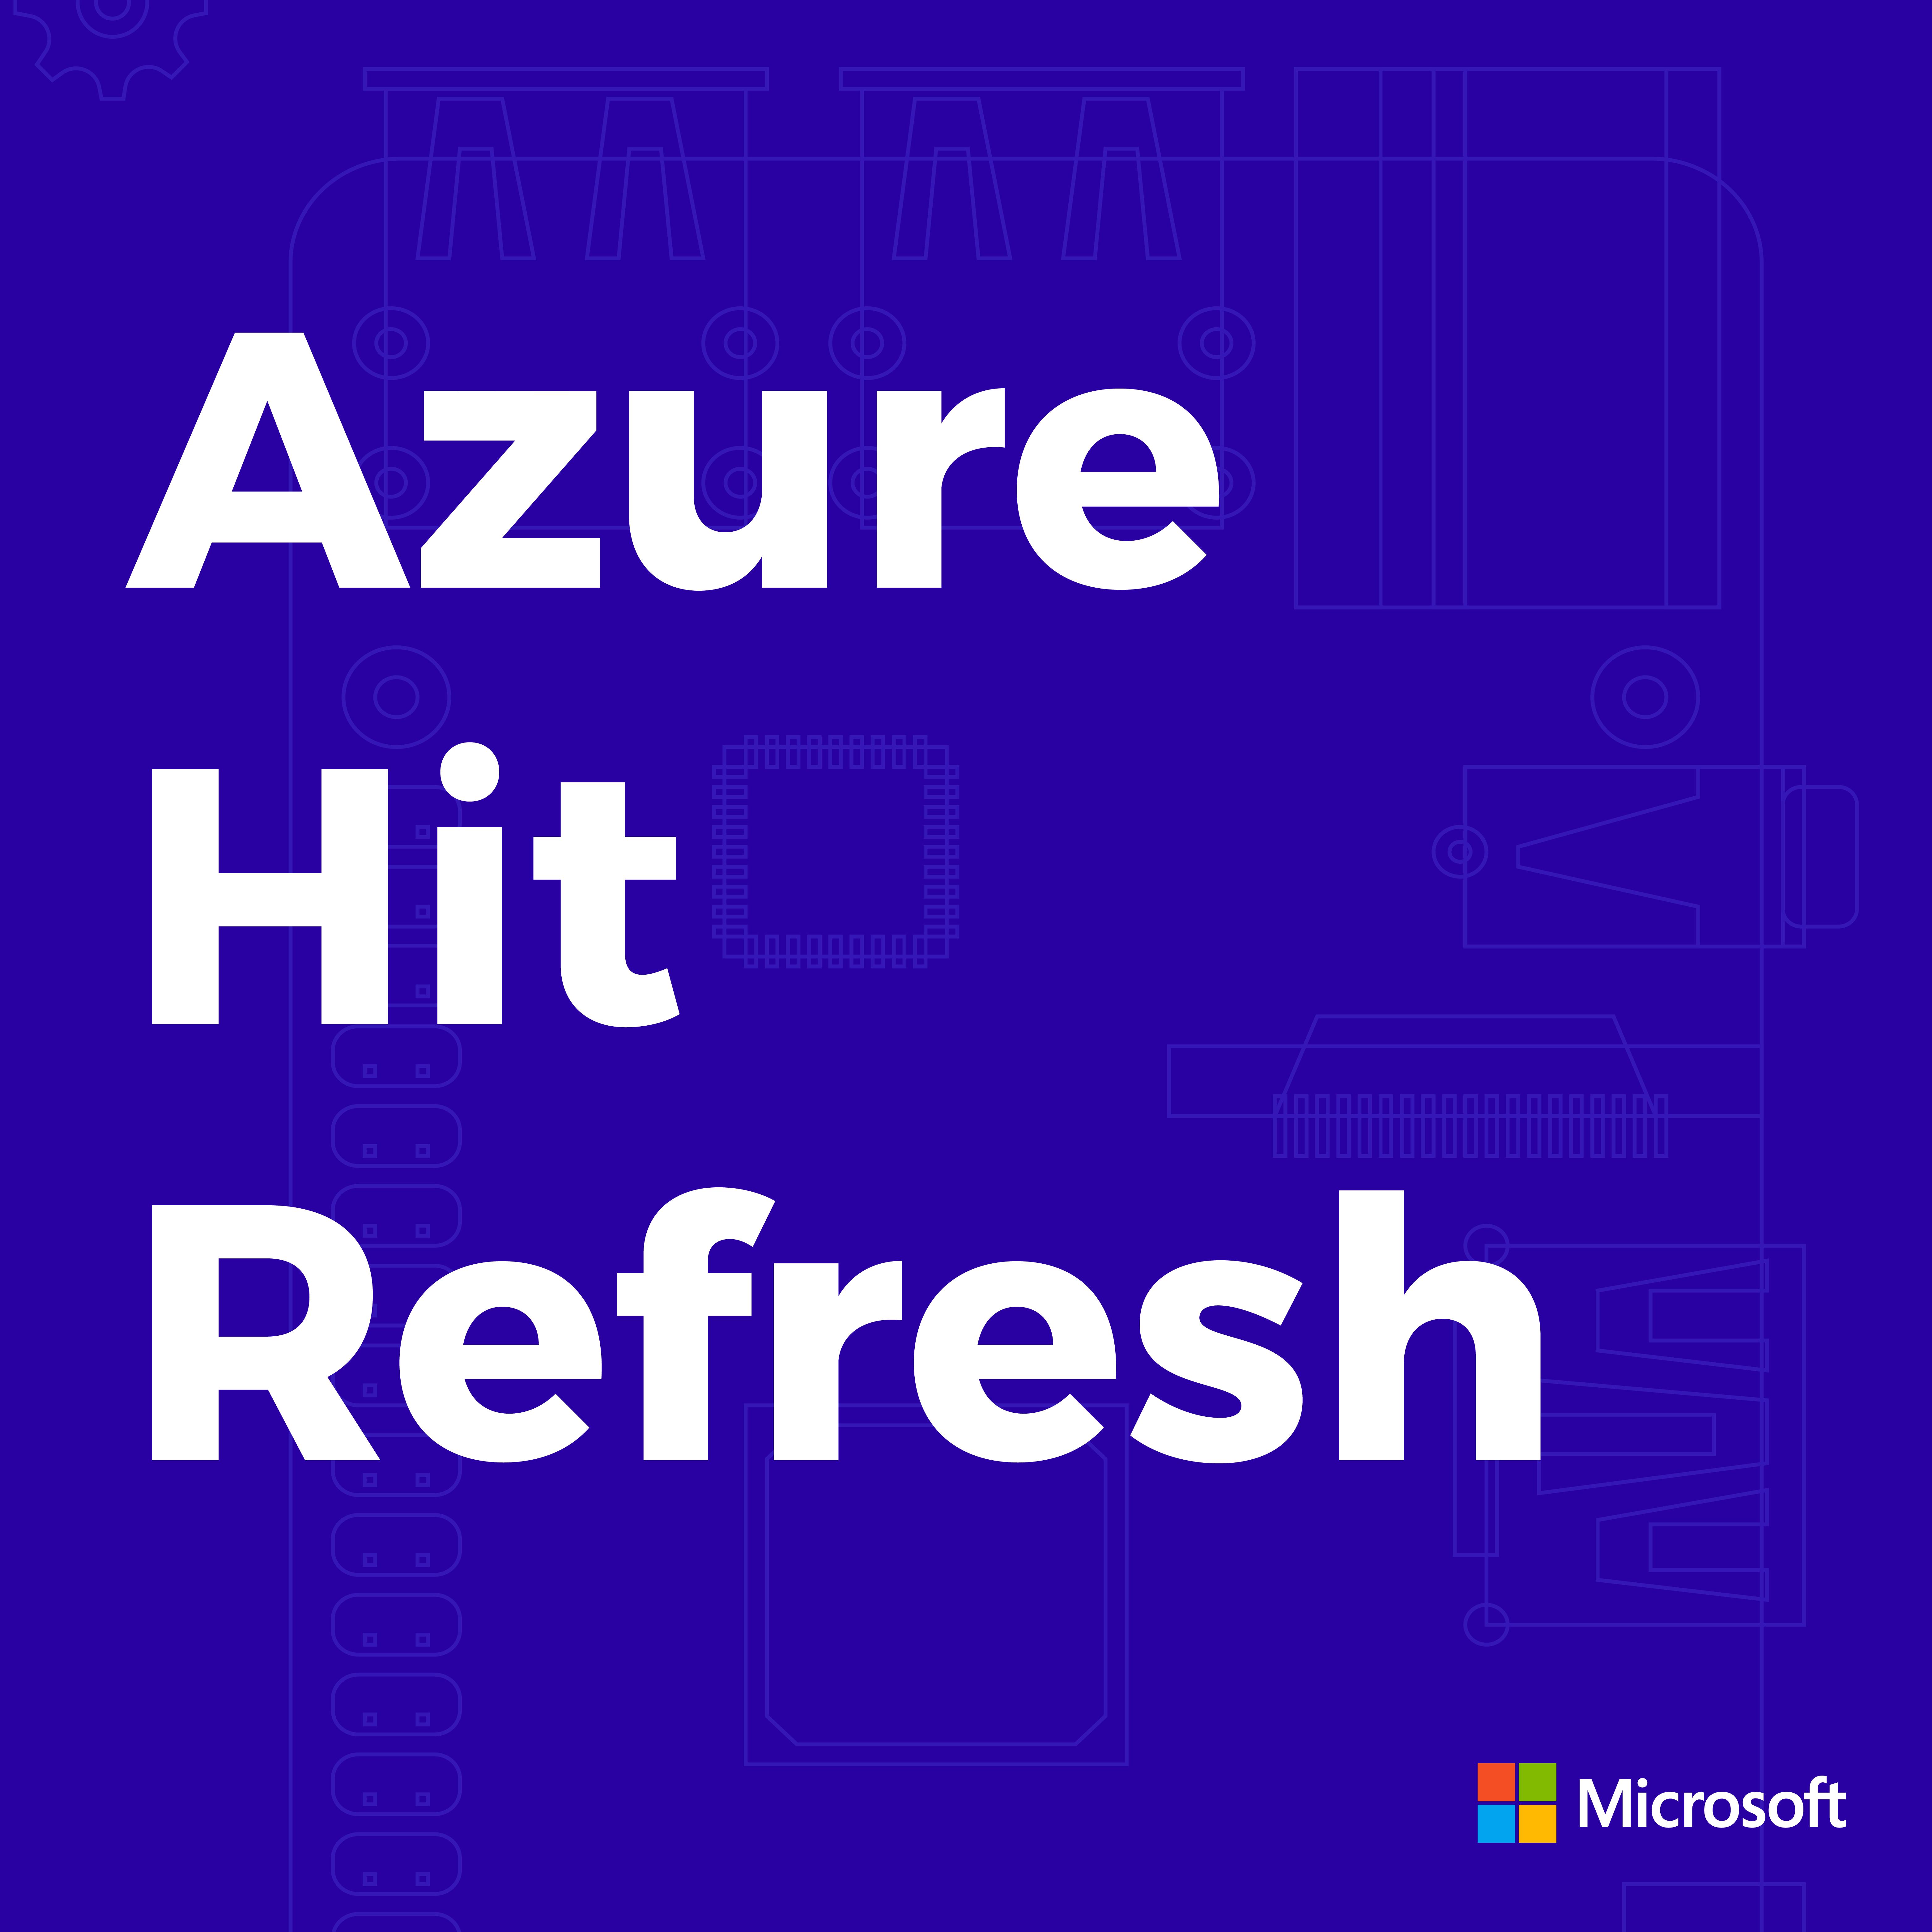 Azure Hit Refresh